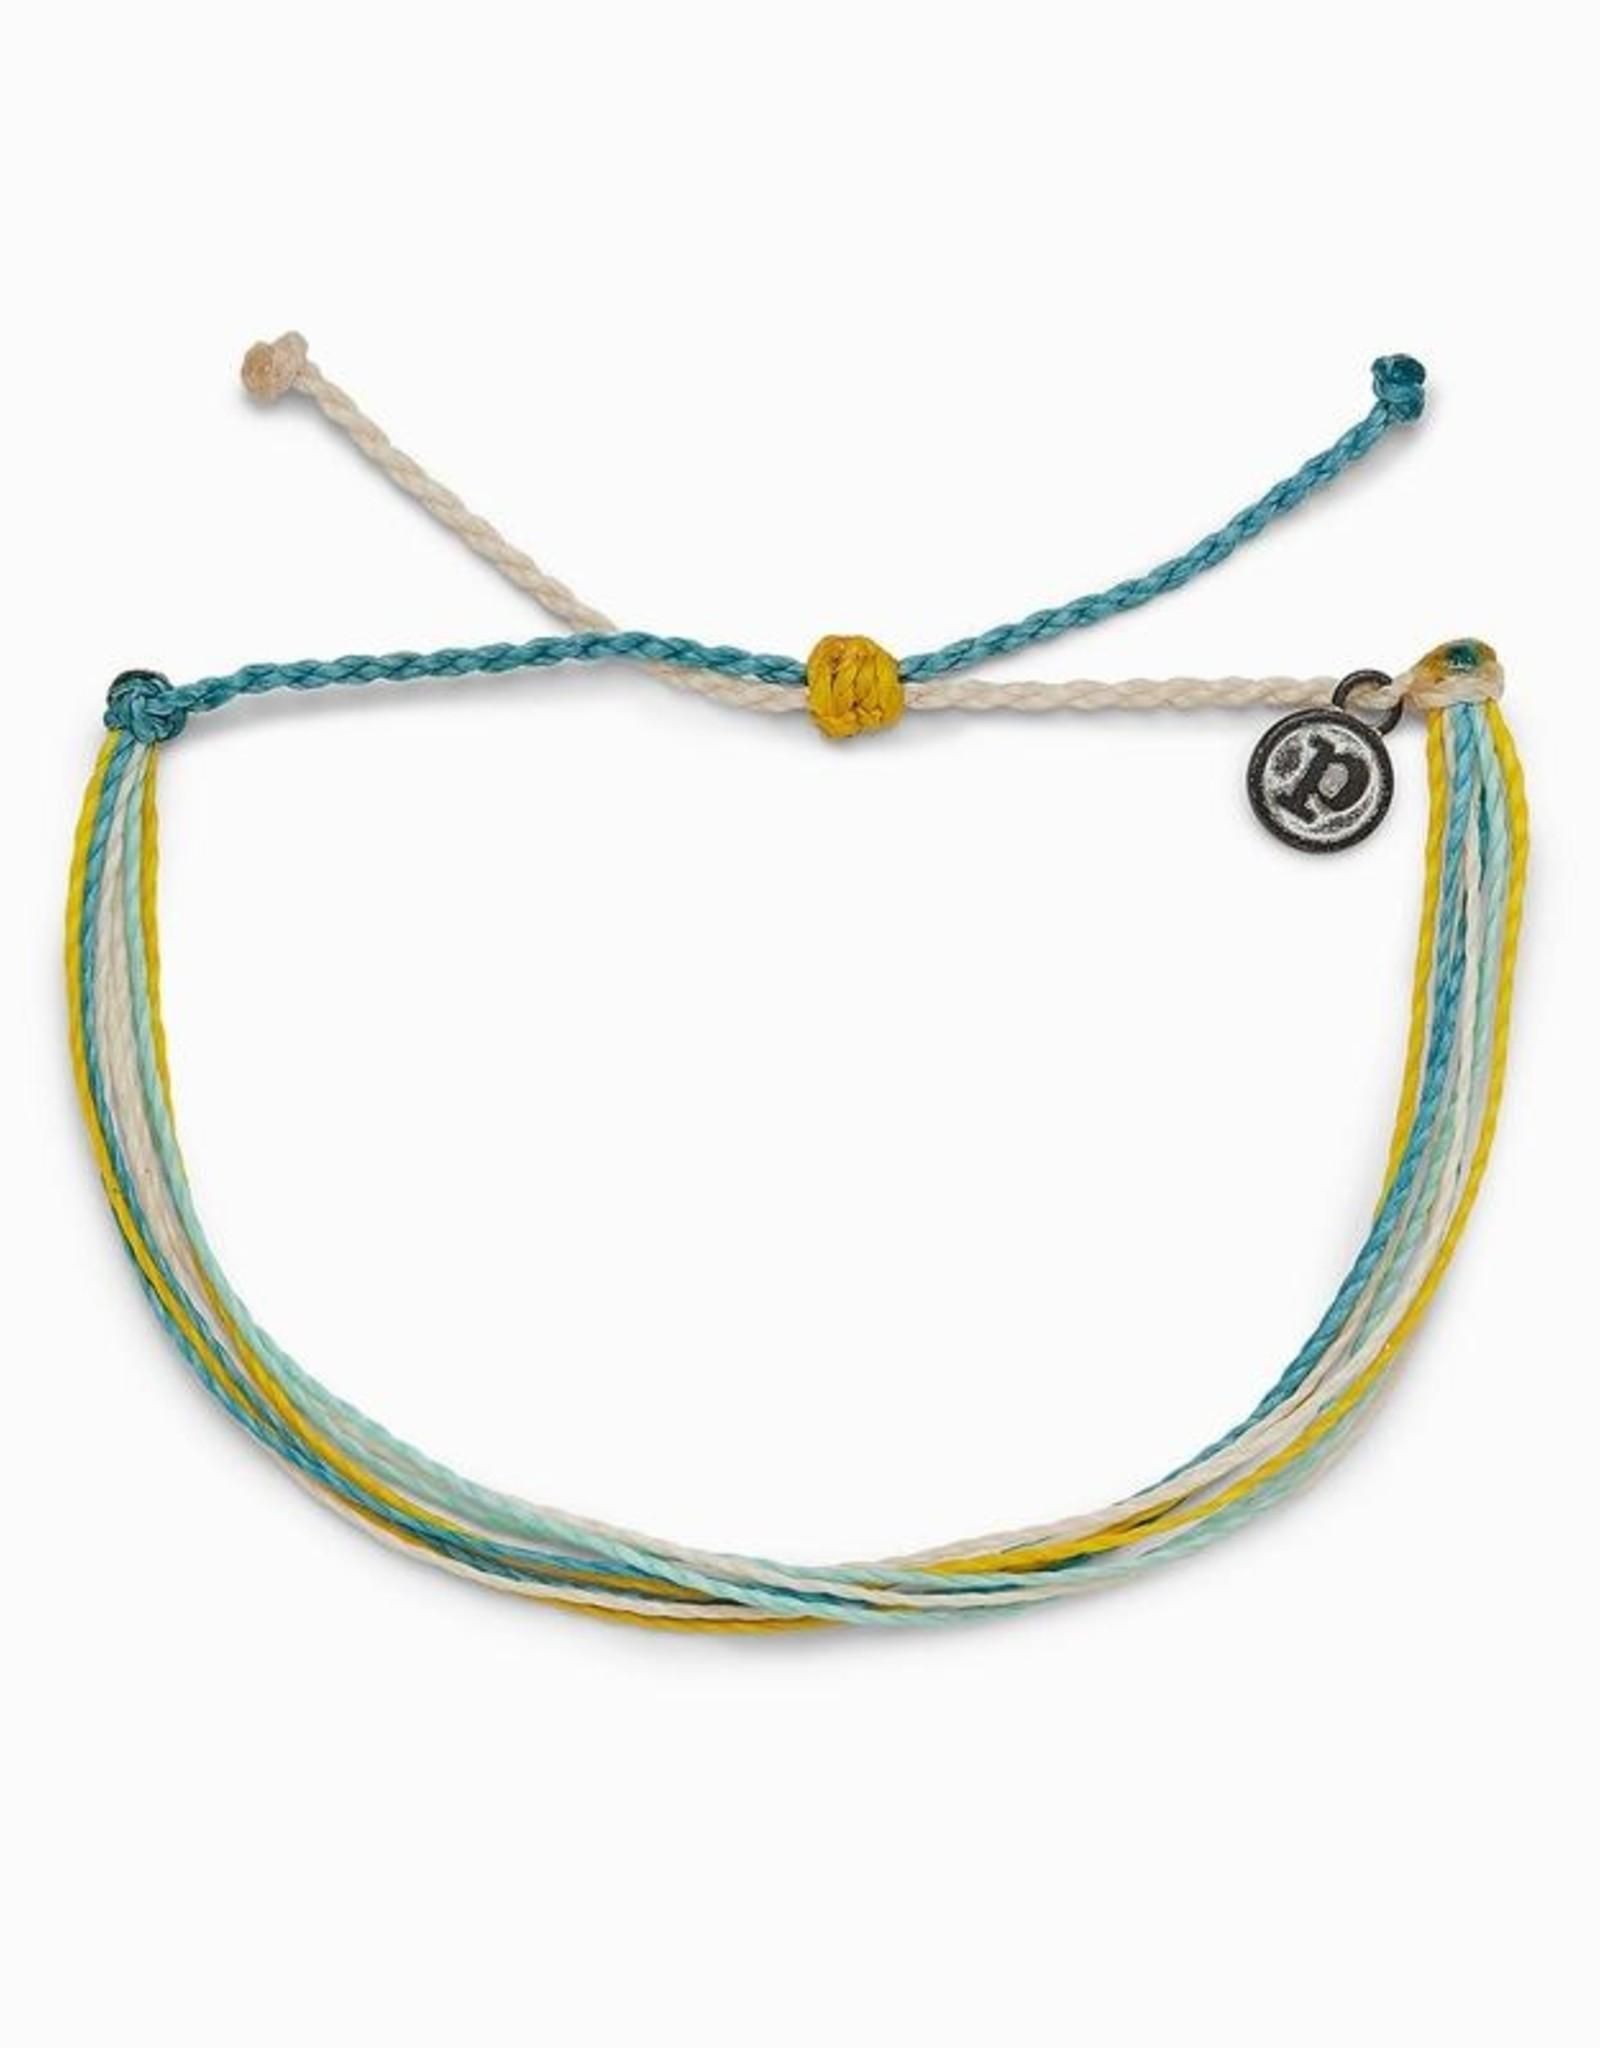 Pura Vida Pura Vida - Original Bracelet - Playa Bonita